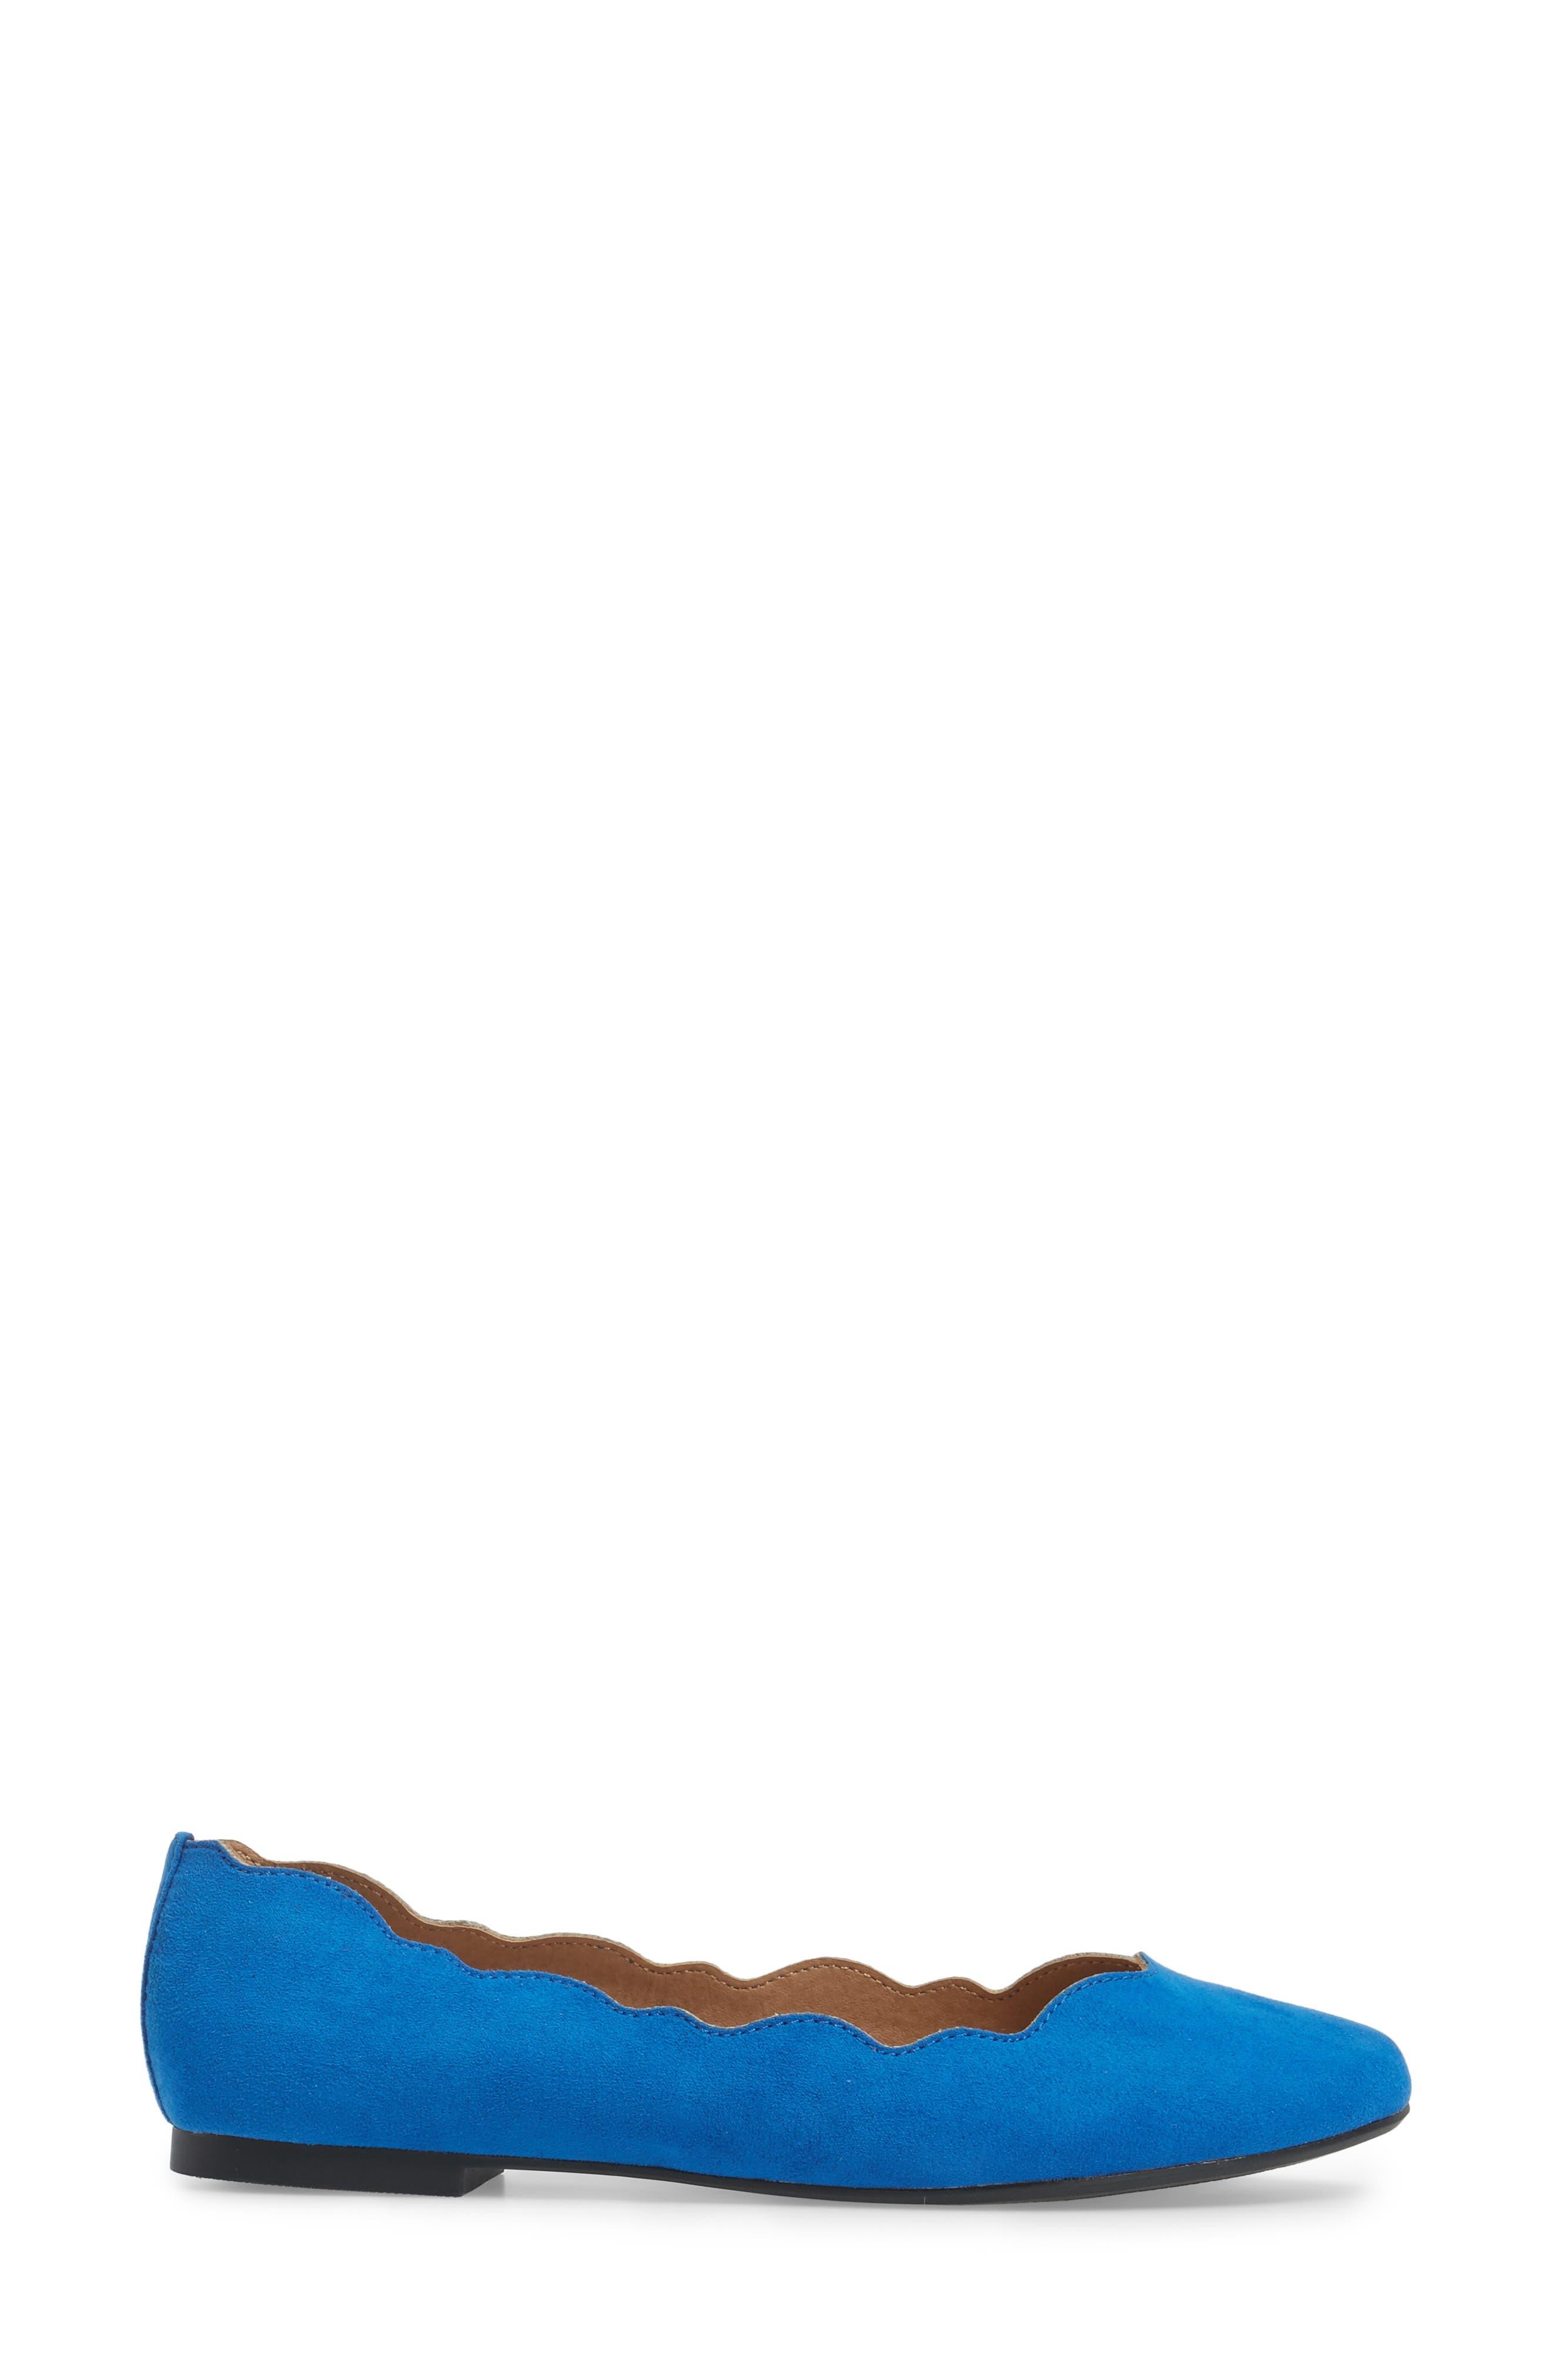 Tallye Ballet Flat,                             Alternate thumbnail 3, color,                             Royal Blue Faux Suede